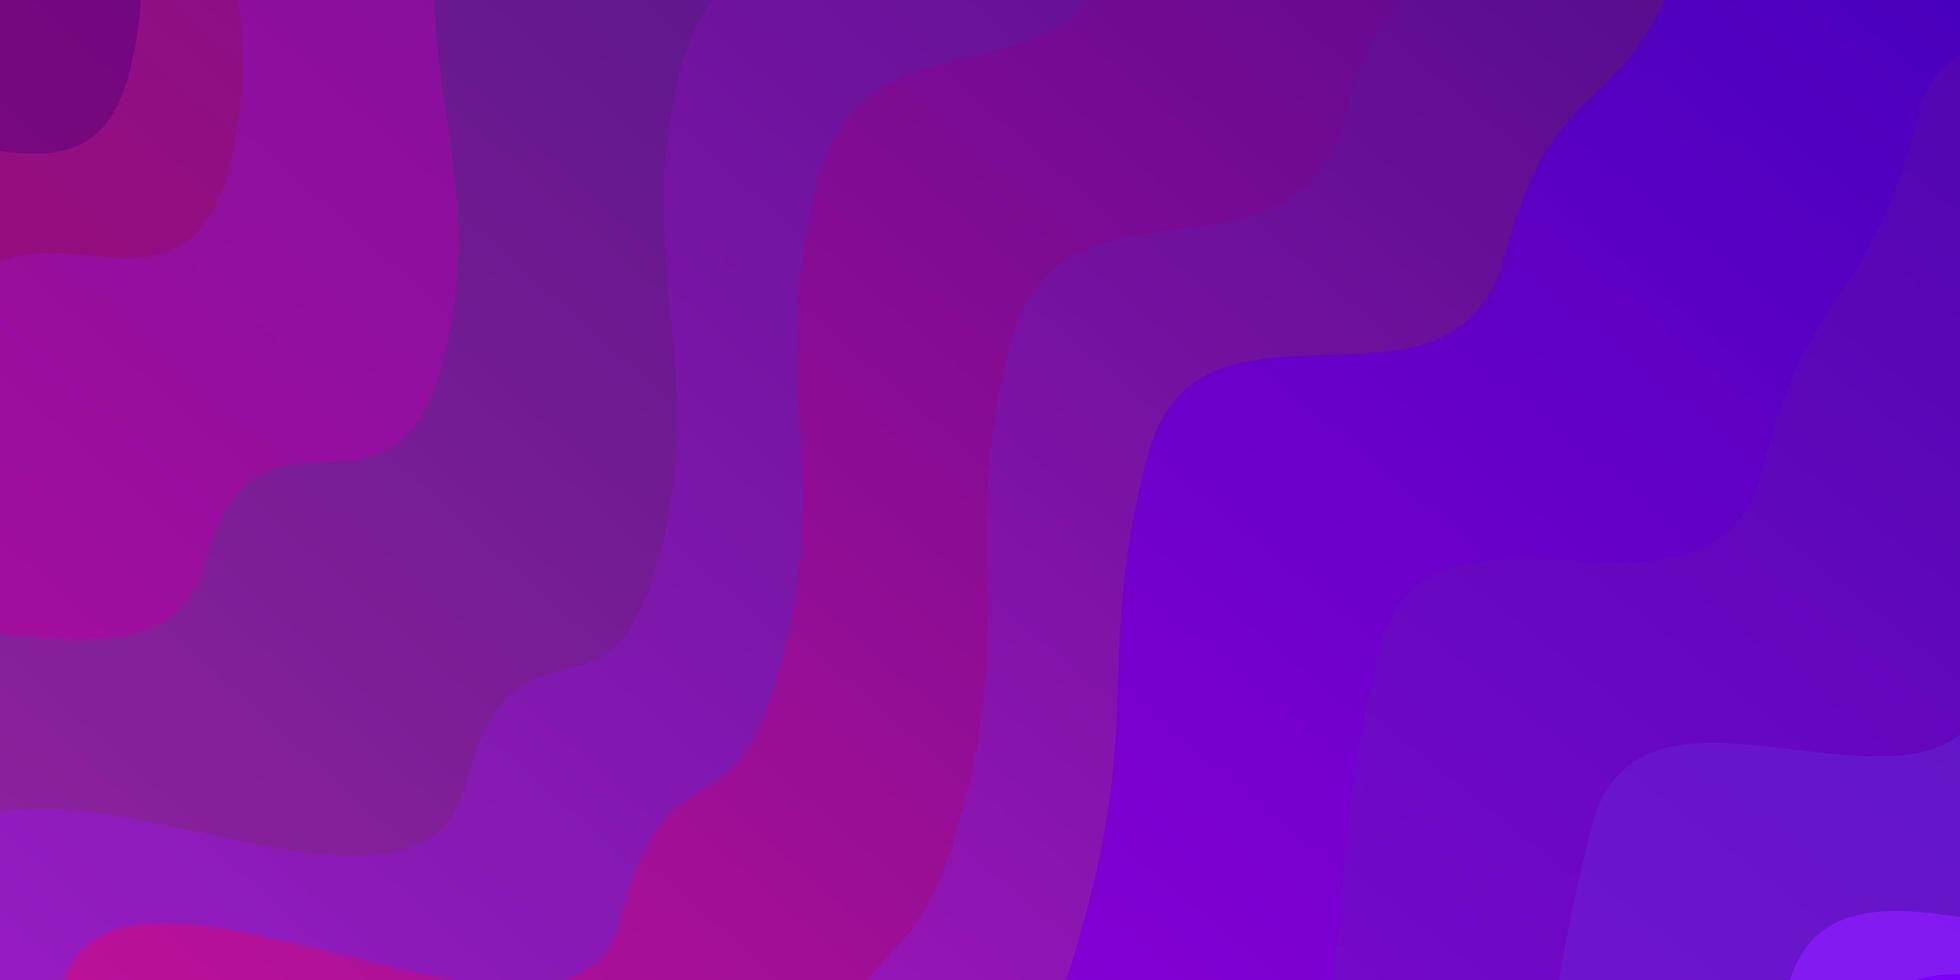 ljuslila, rosa vektormall med linjer. vektor